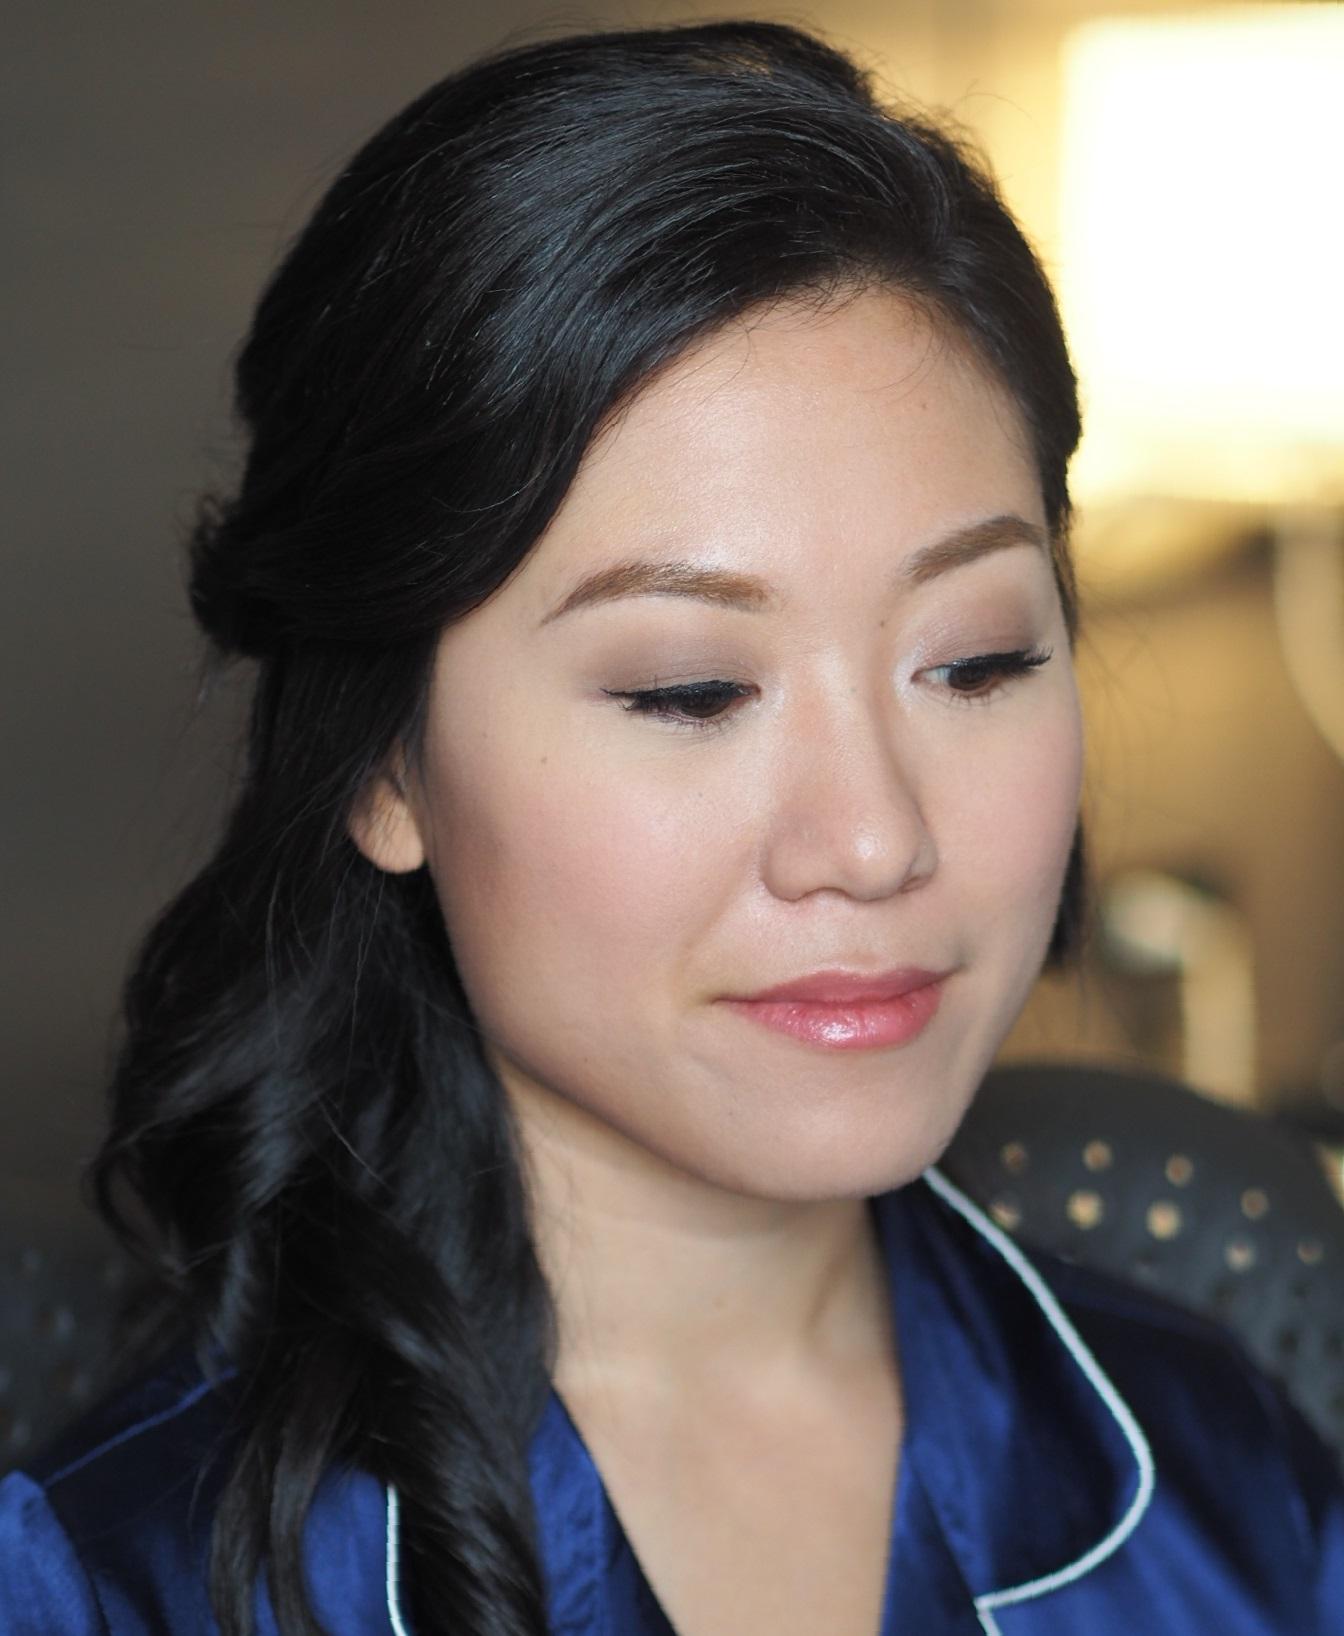 Chinese makeup artist Toronto Markham